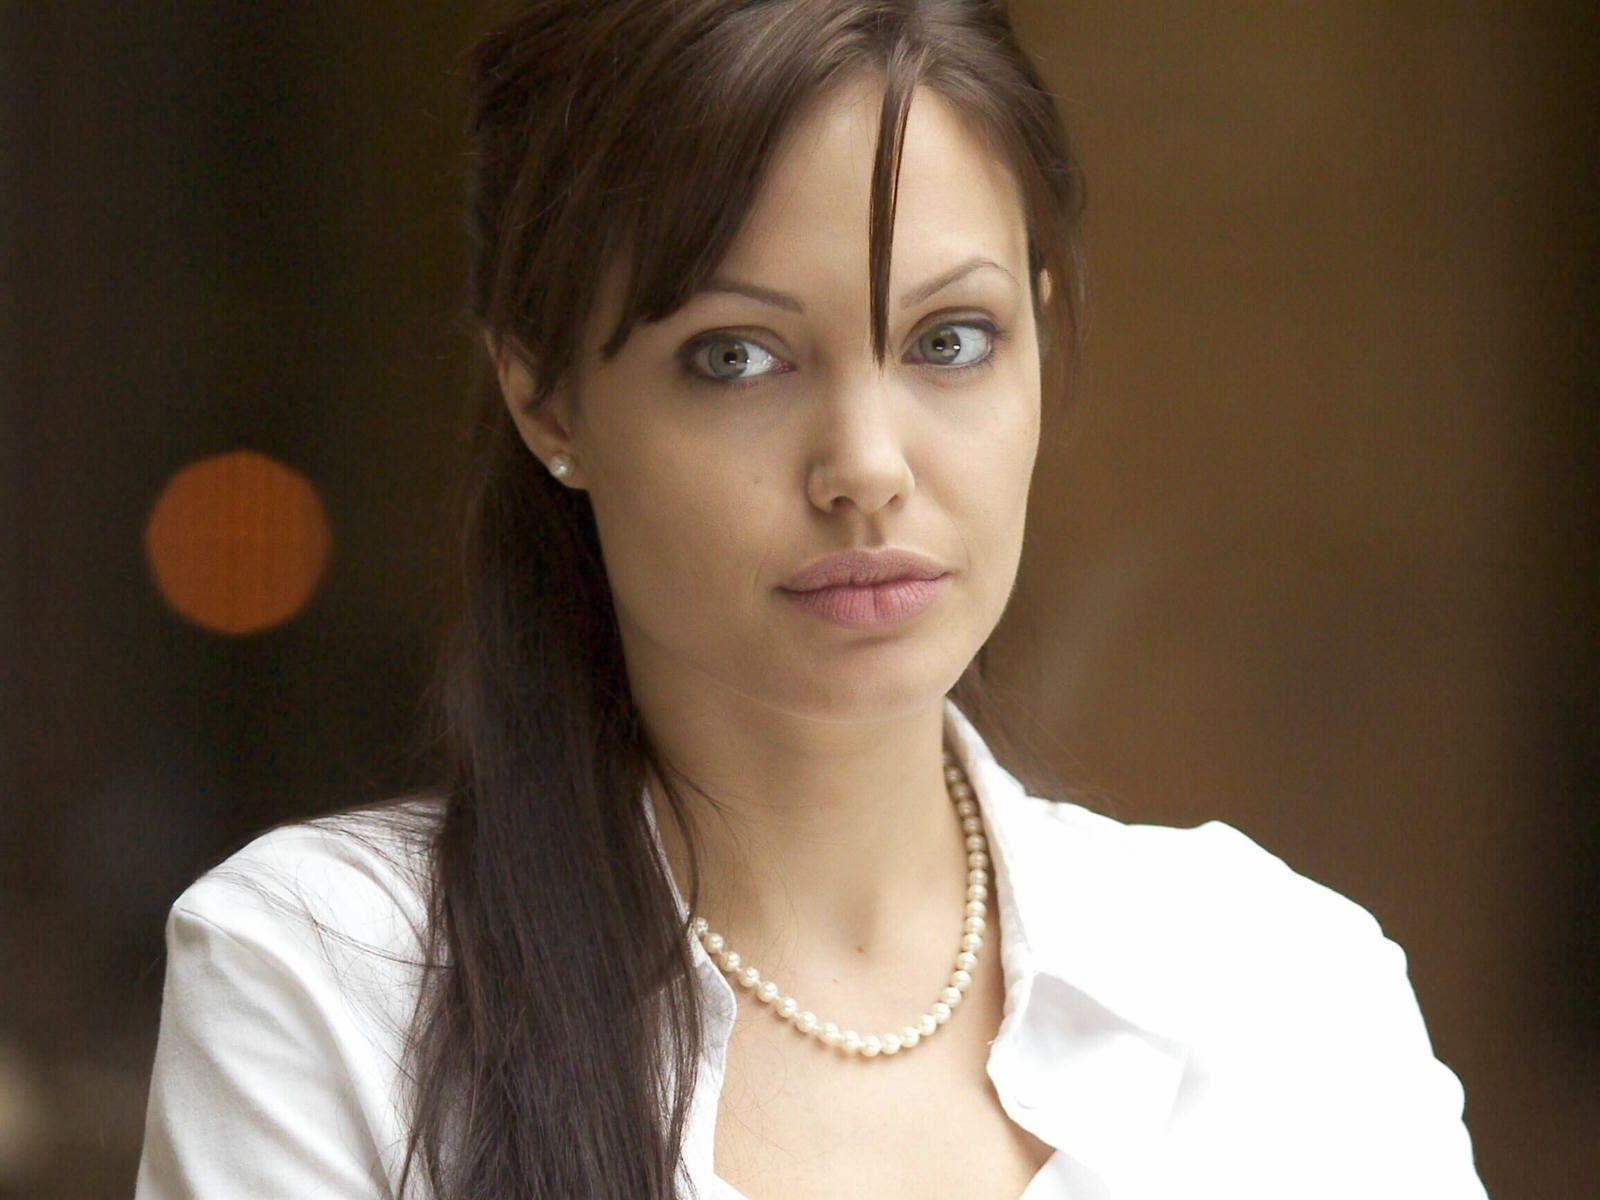 Angelina Jolie photo, pics, wallpaper - photo #446233